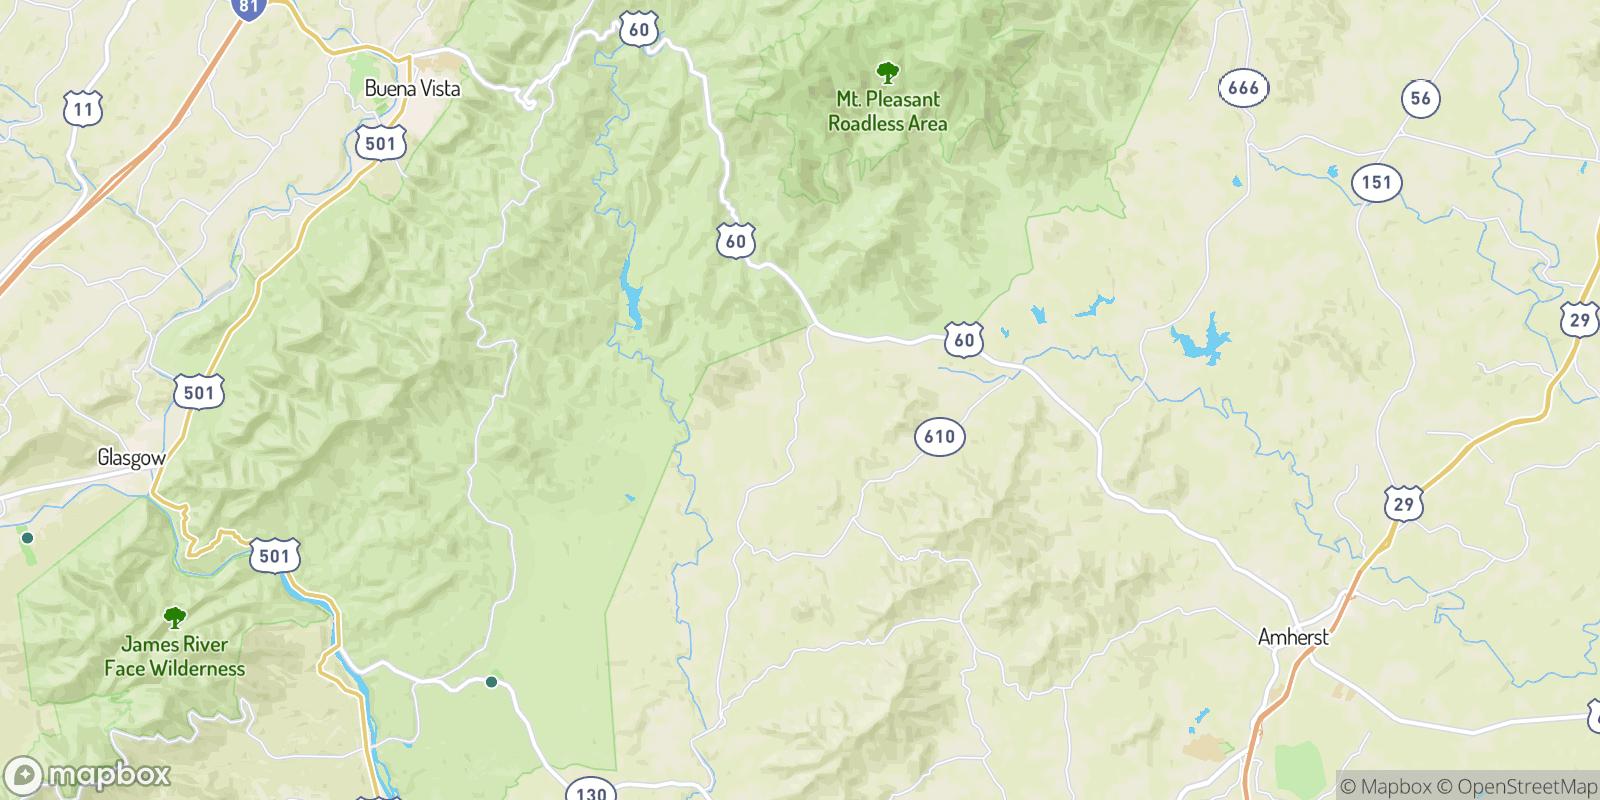 The best camping near Allwood, Virginia